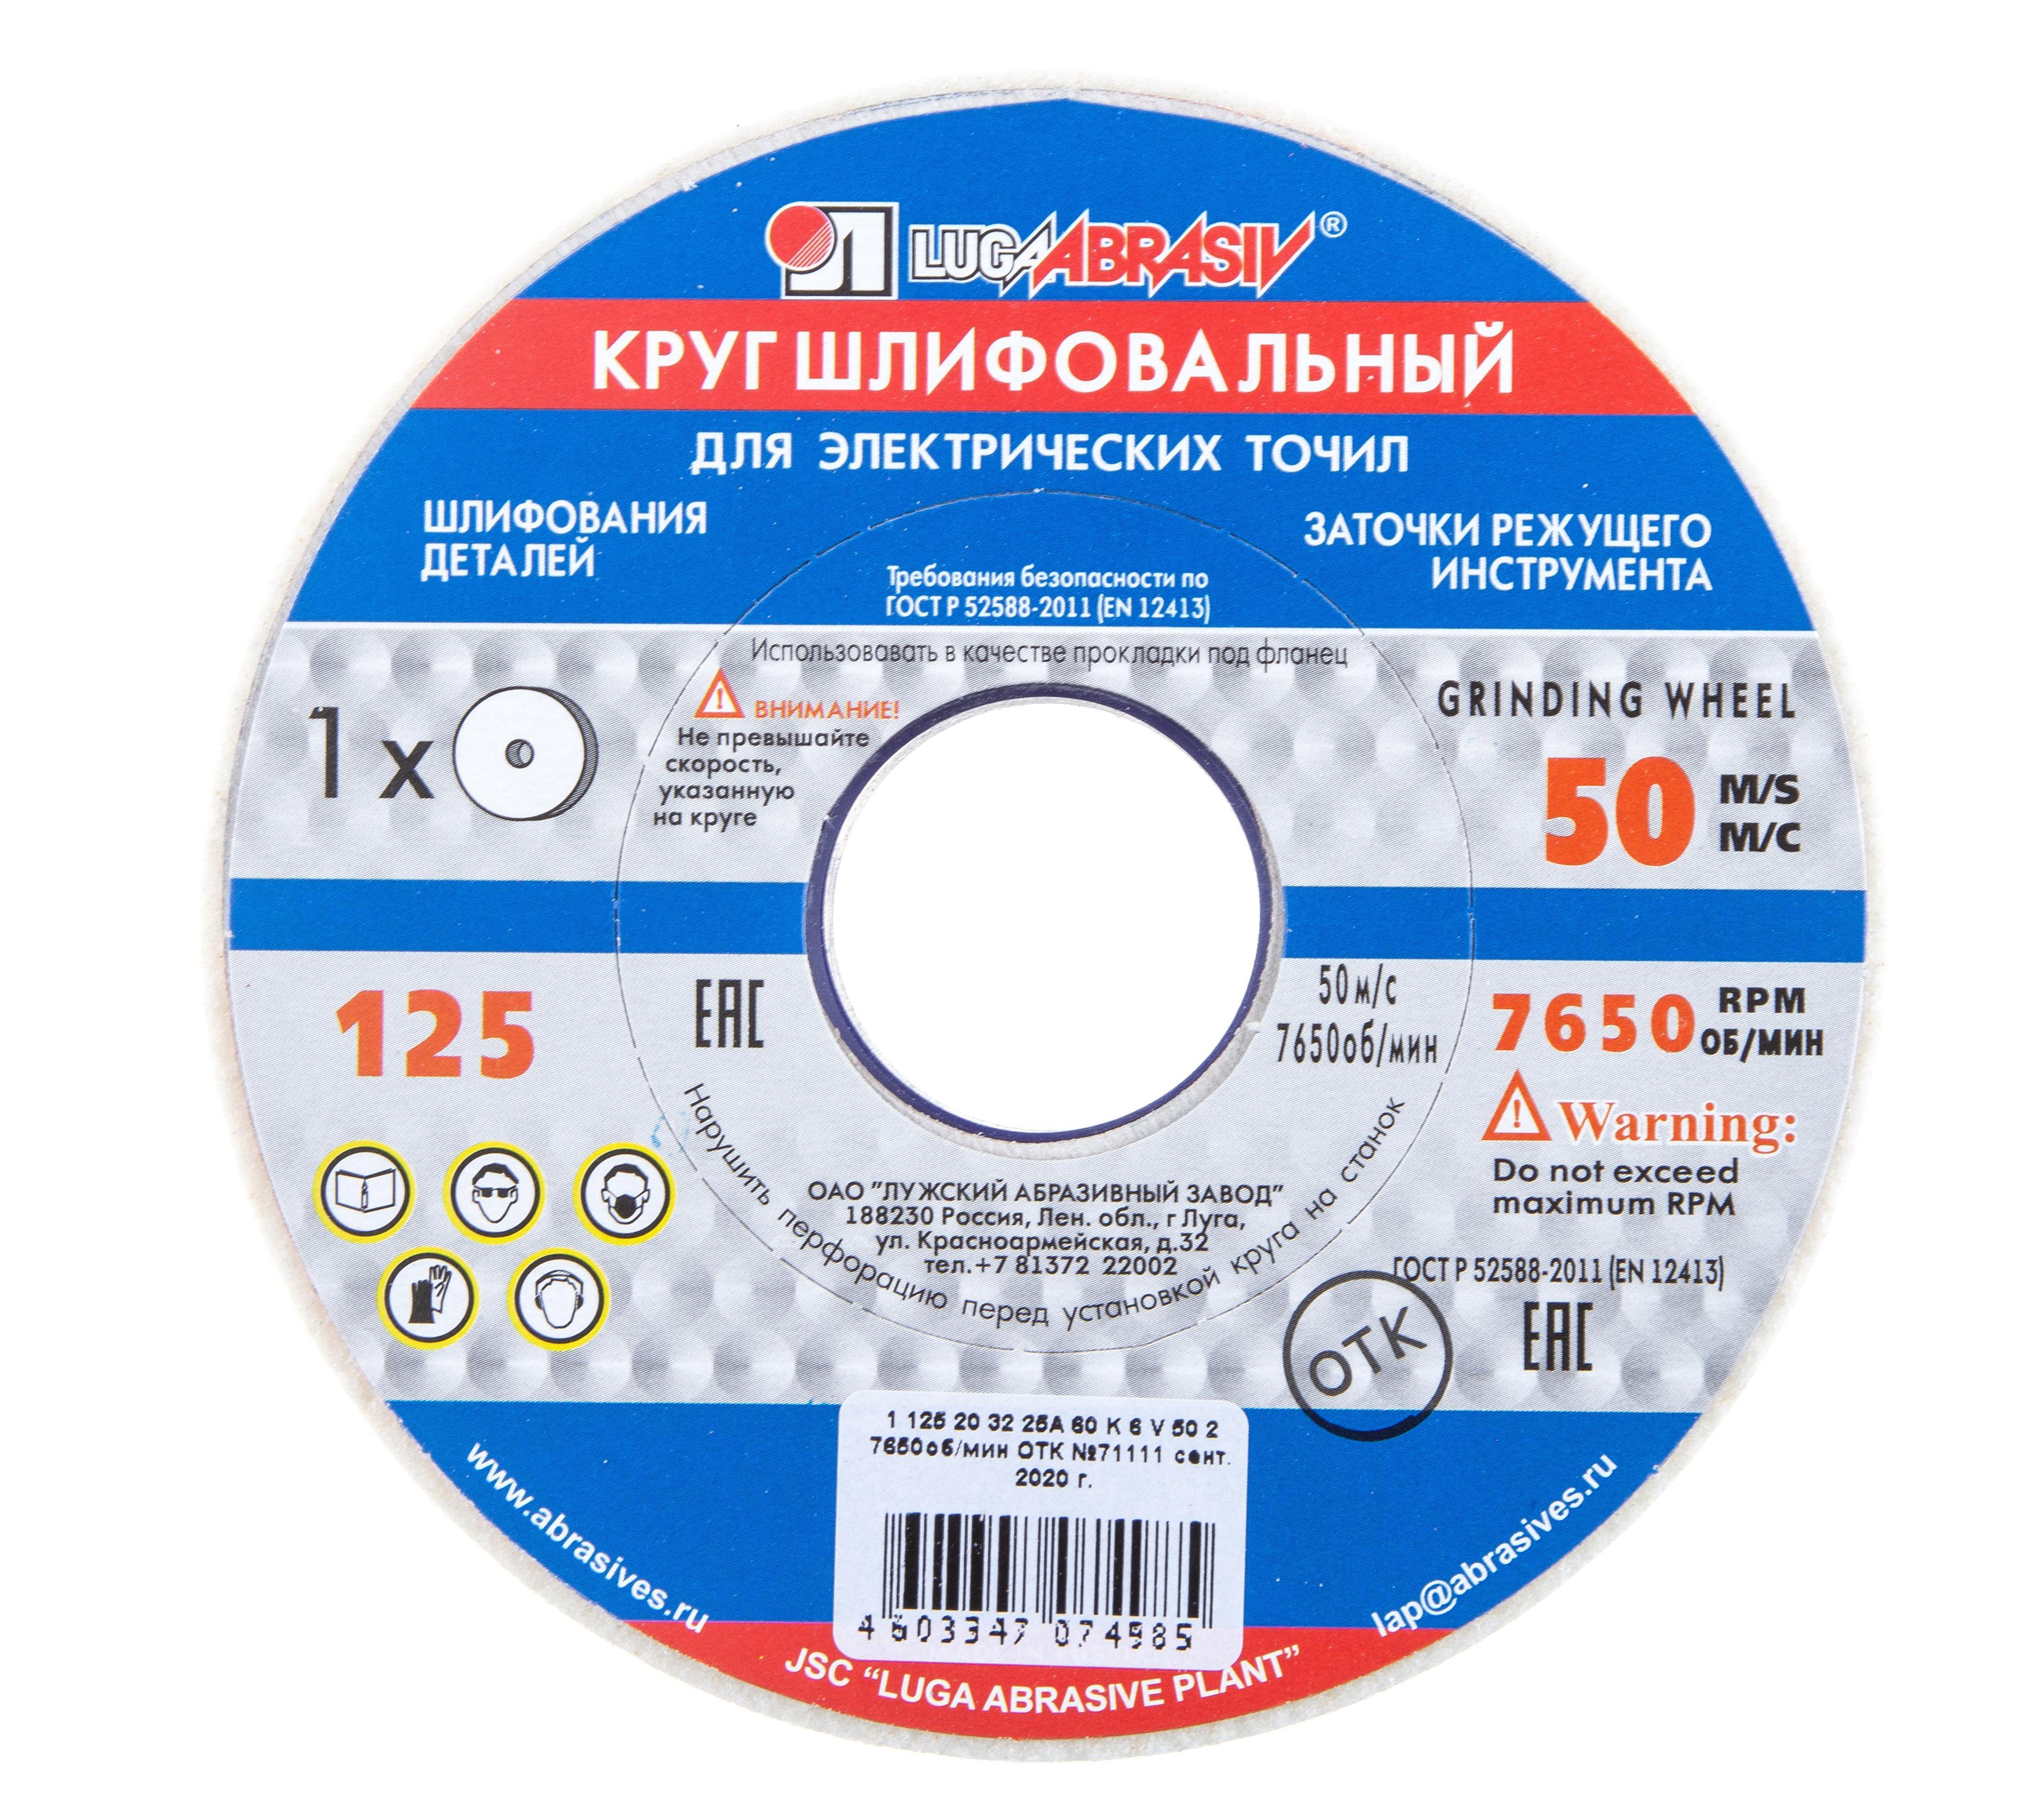 Круг шлифовальный ЛУГА-АБРАЗИВ 1 125 Х 20 Х 32 25А 60 k,l (25СМ) kx matrikx 1 01 425 125 20 carbon block filter 20 x 4 25